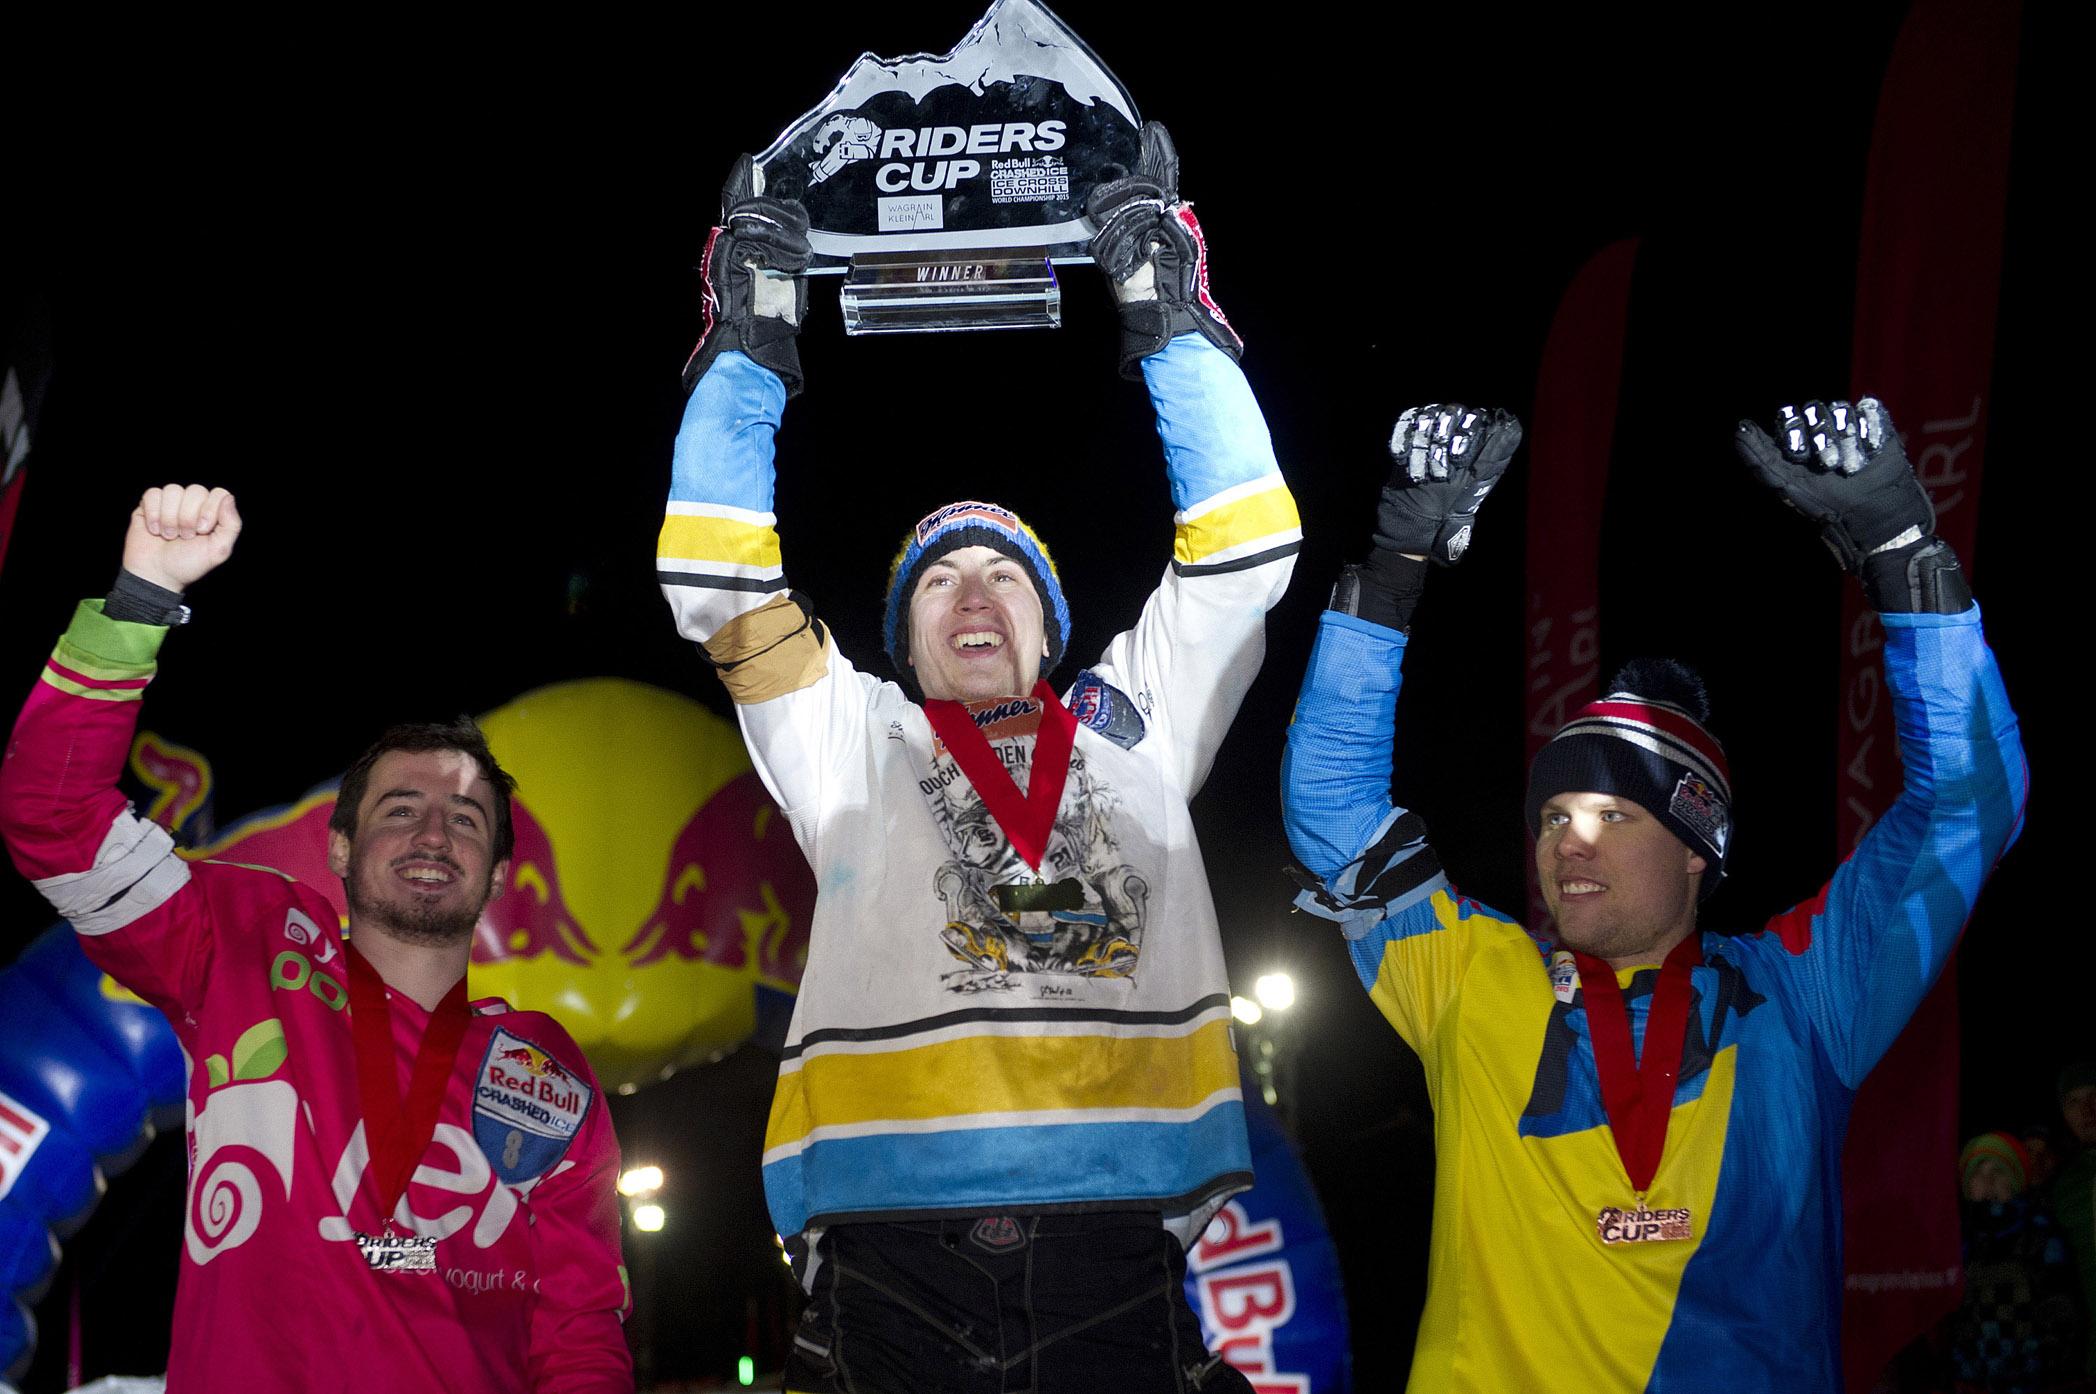 Ice Cross Downhill Riders Cup Wagrain-Kleinarl Austria